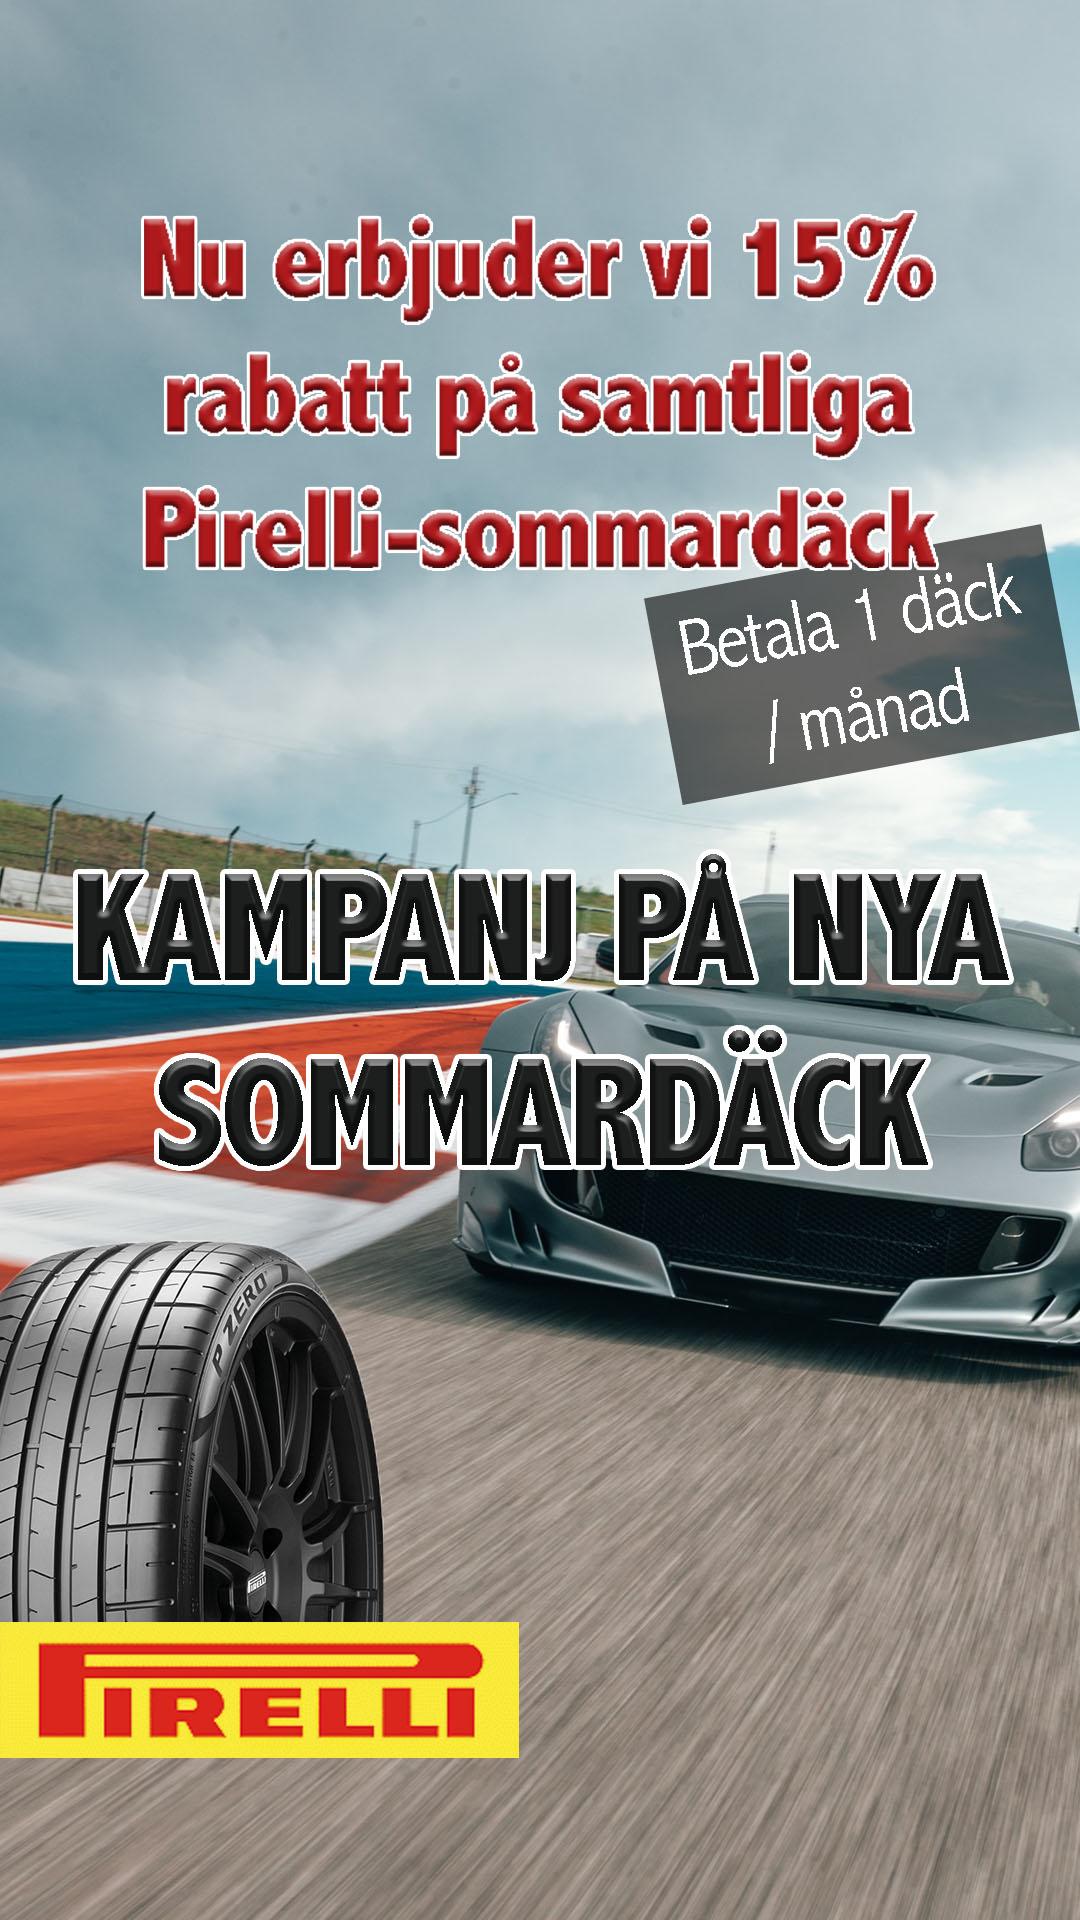 Pirelli sommardäck nu 15% rabatt